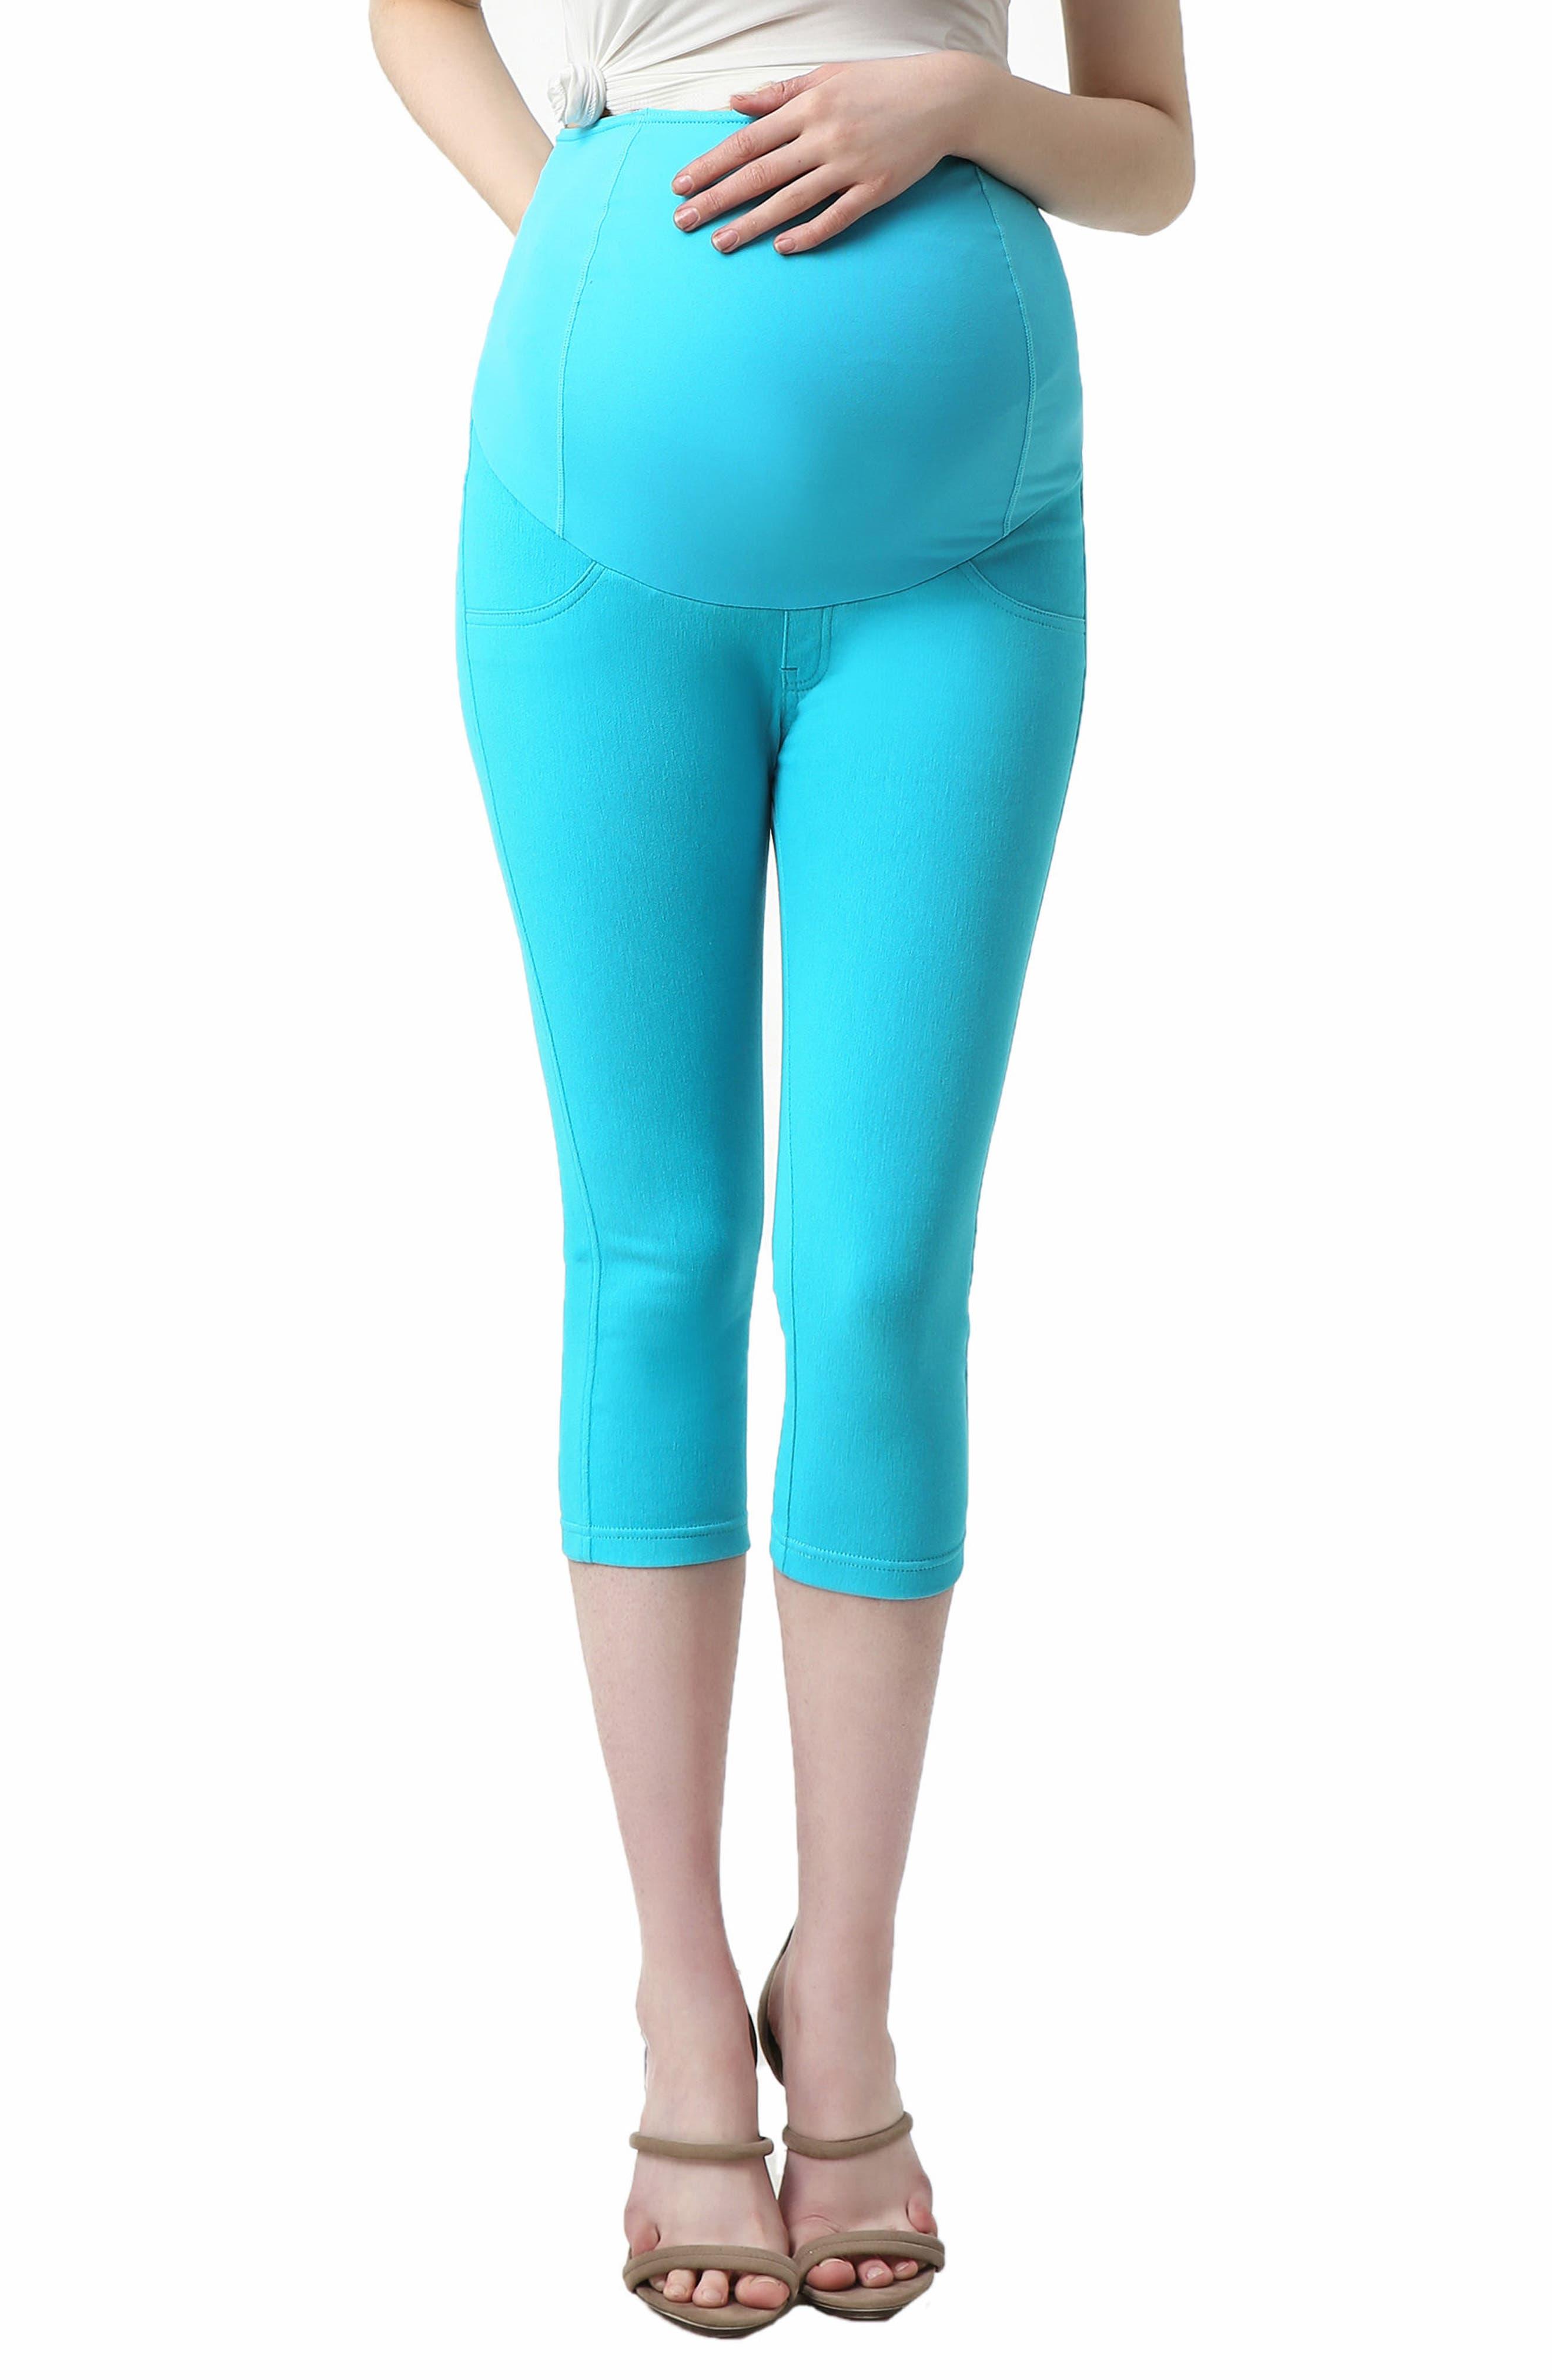 Melody Capri Denim Maternity Leggings,                         Main,                         color, Aqua Blue